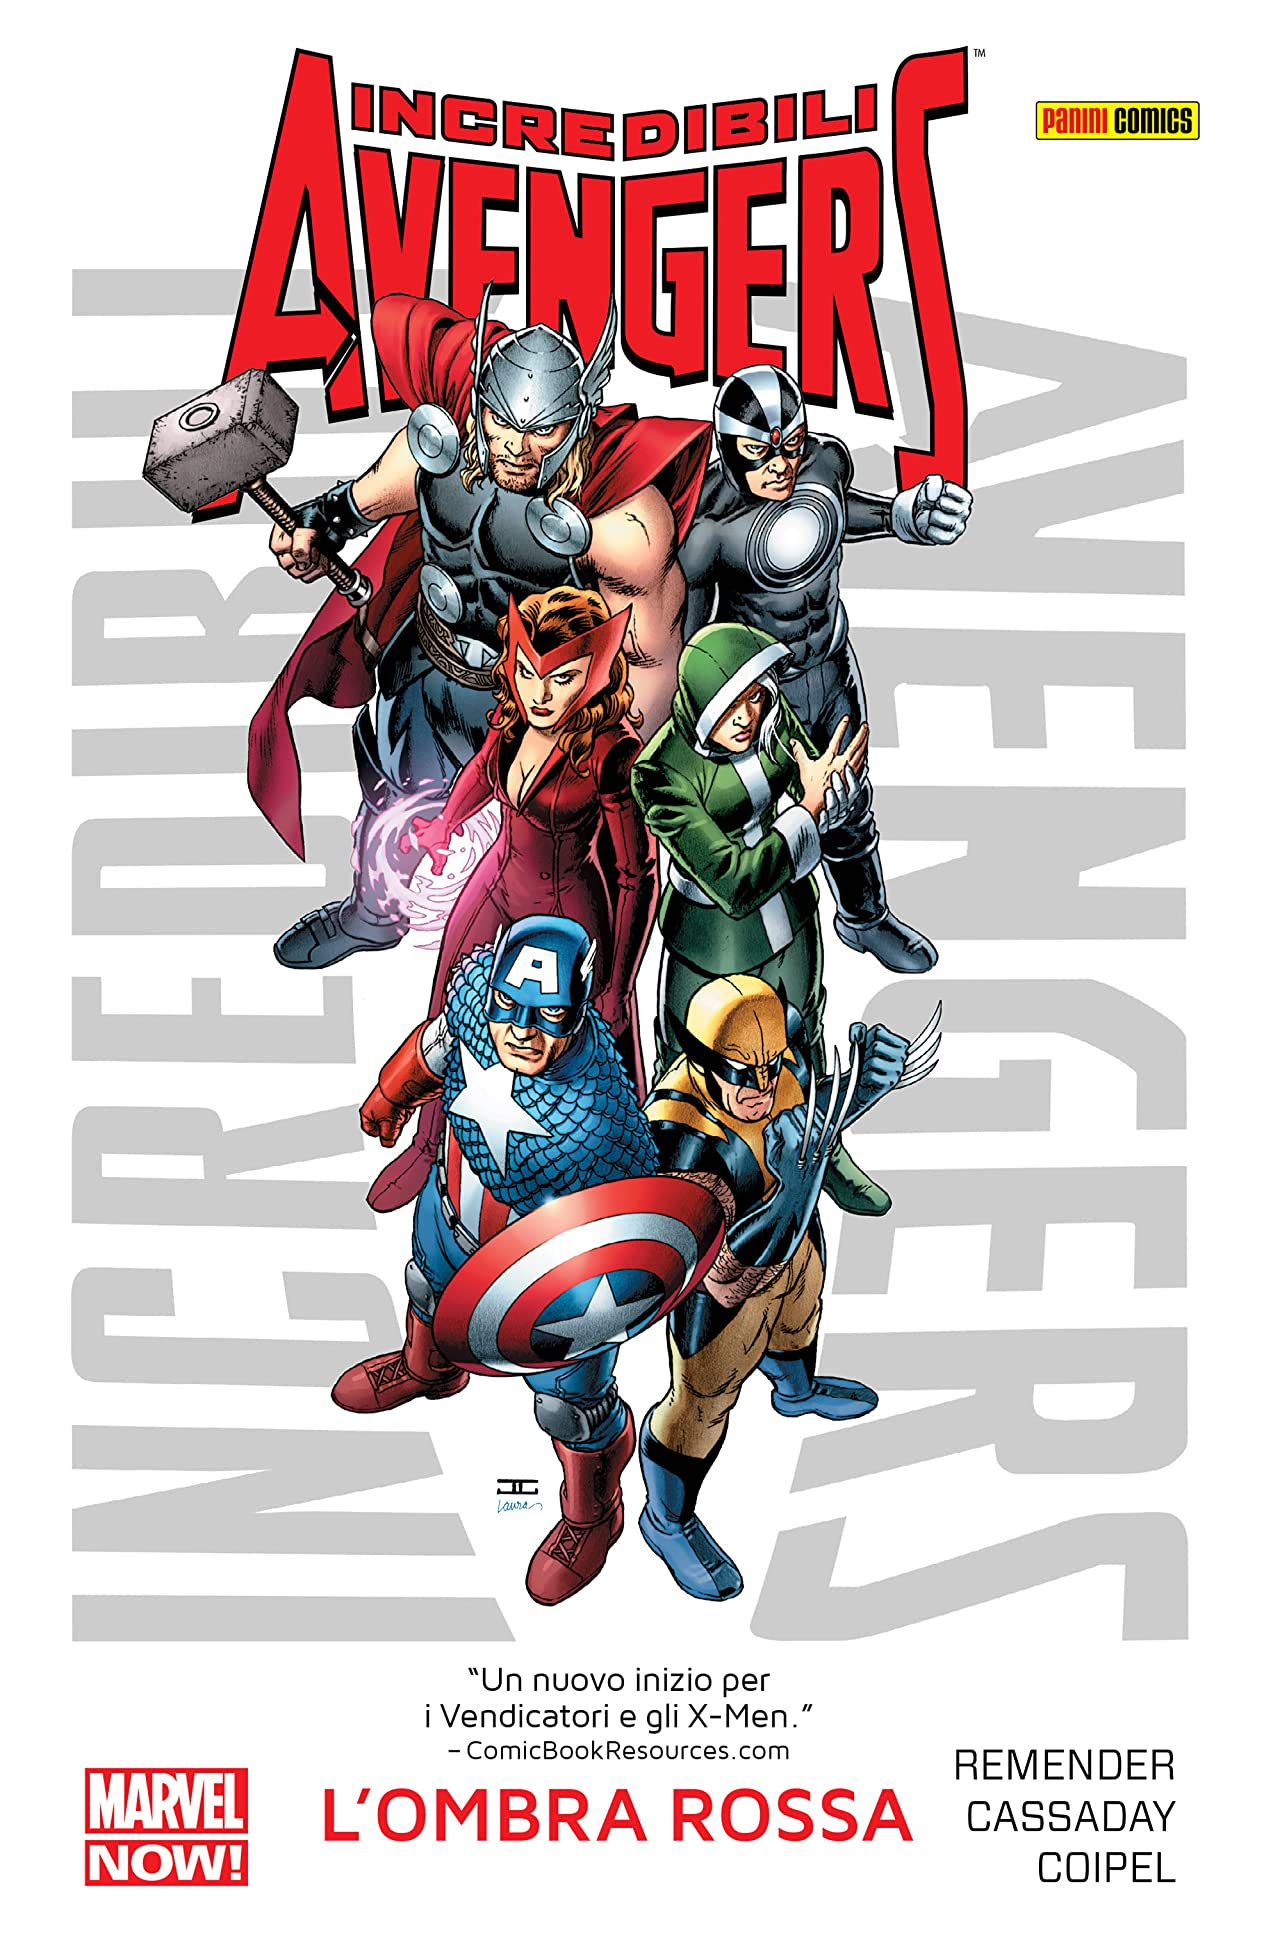 Incredibili Avengers Vol. 1: Ombra Rossa